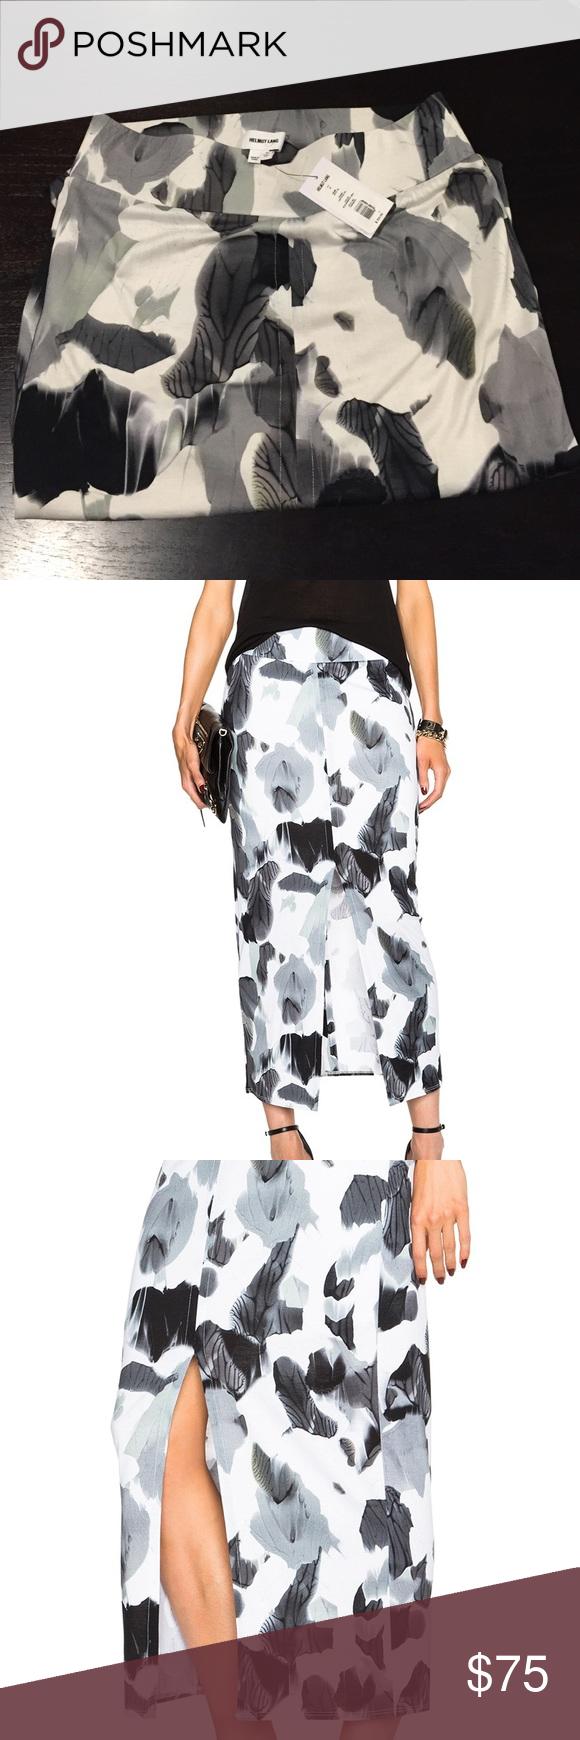 Helmut Lang Women's Crypsis-Print Jersey Skirt Midi skirt with a monochromatic gray and black pattern. Helmut Lang Skirts Midi